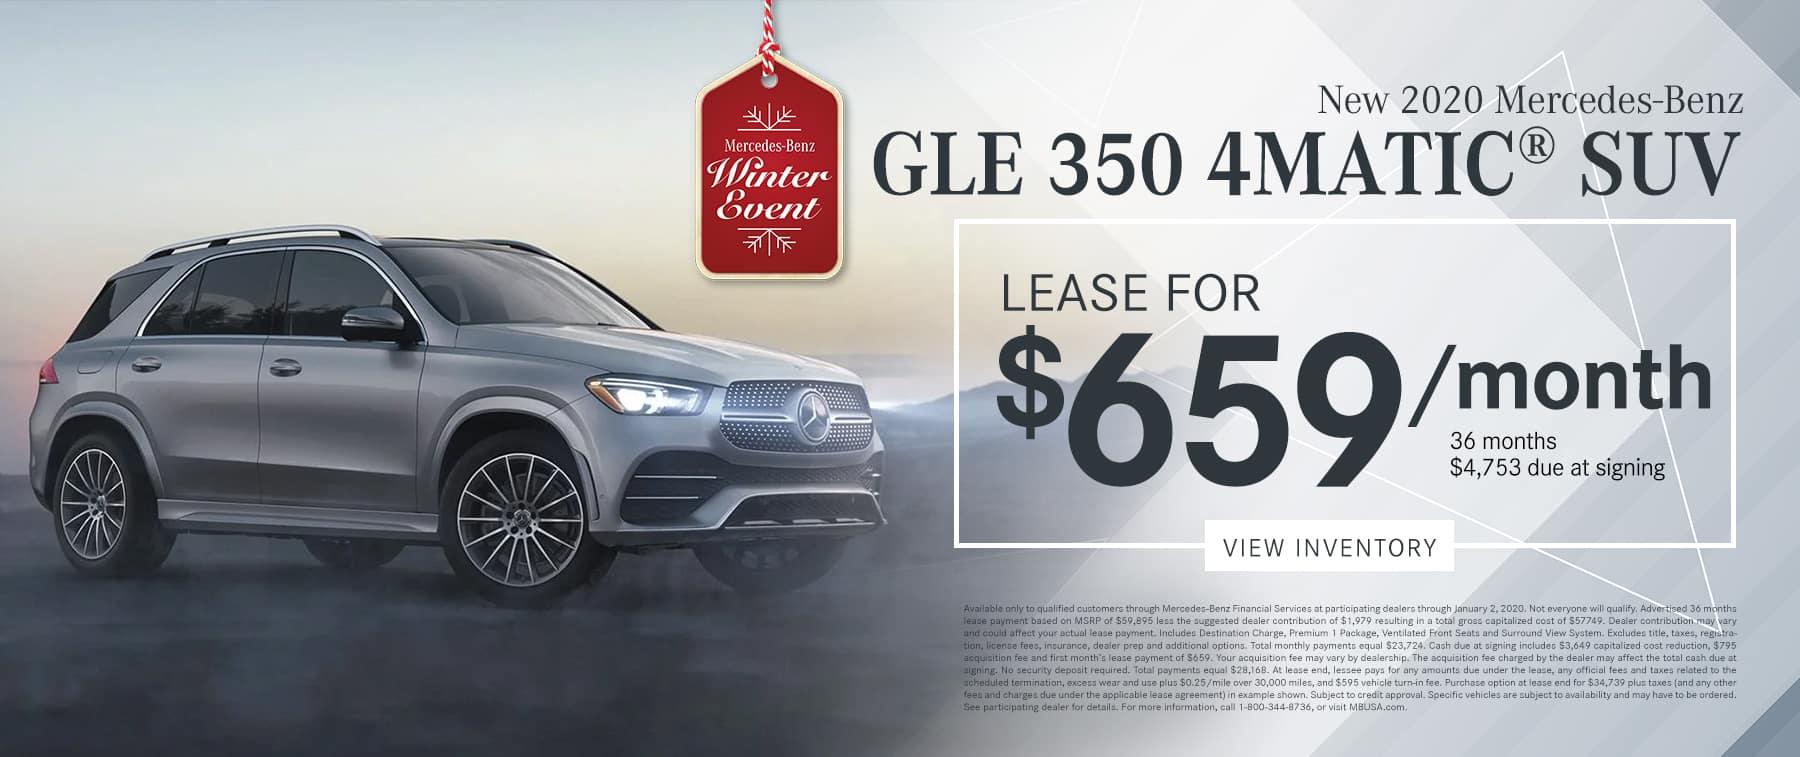 2020 GLE 350 4MATIC® SUV LEASE FOR $659/MO.